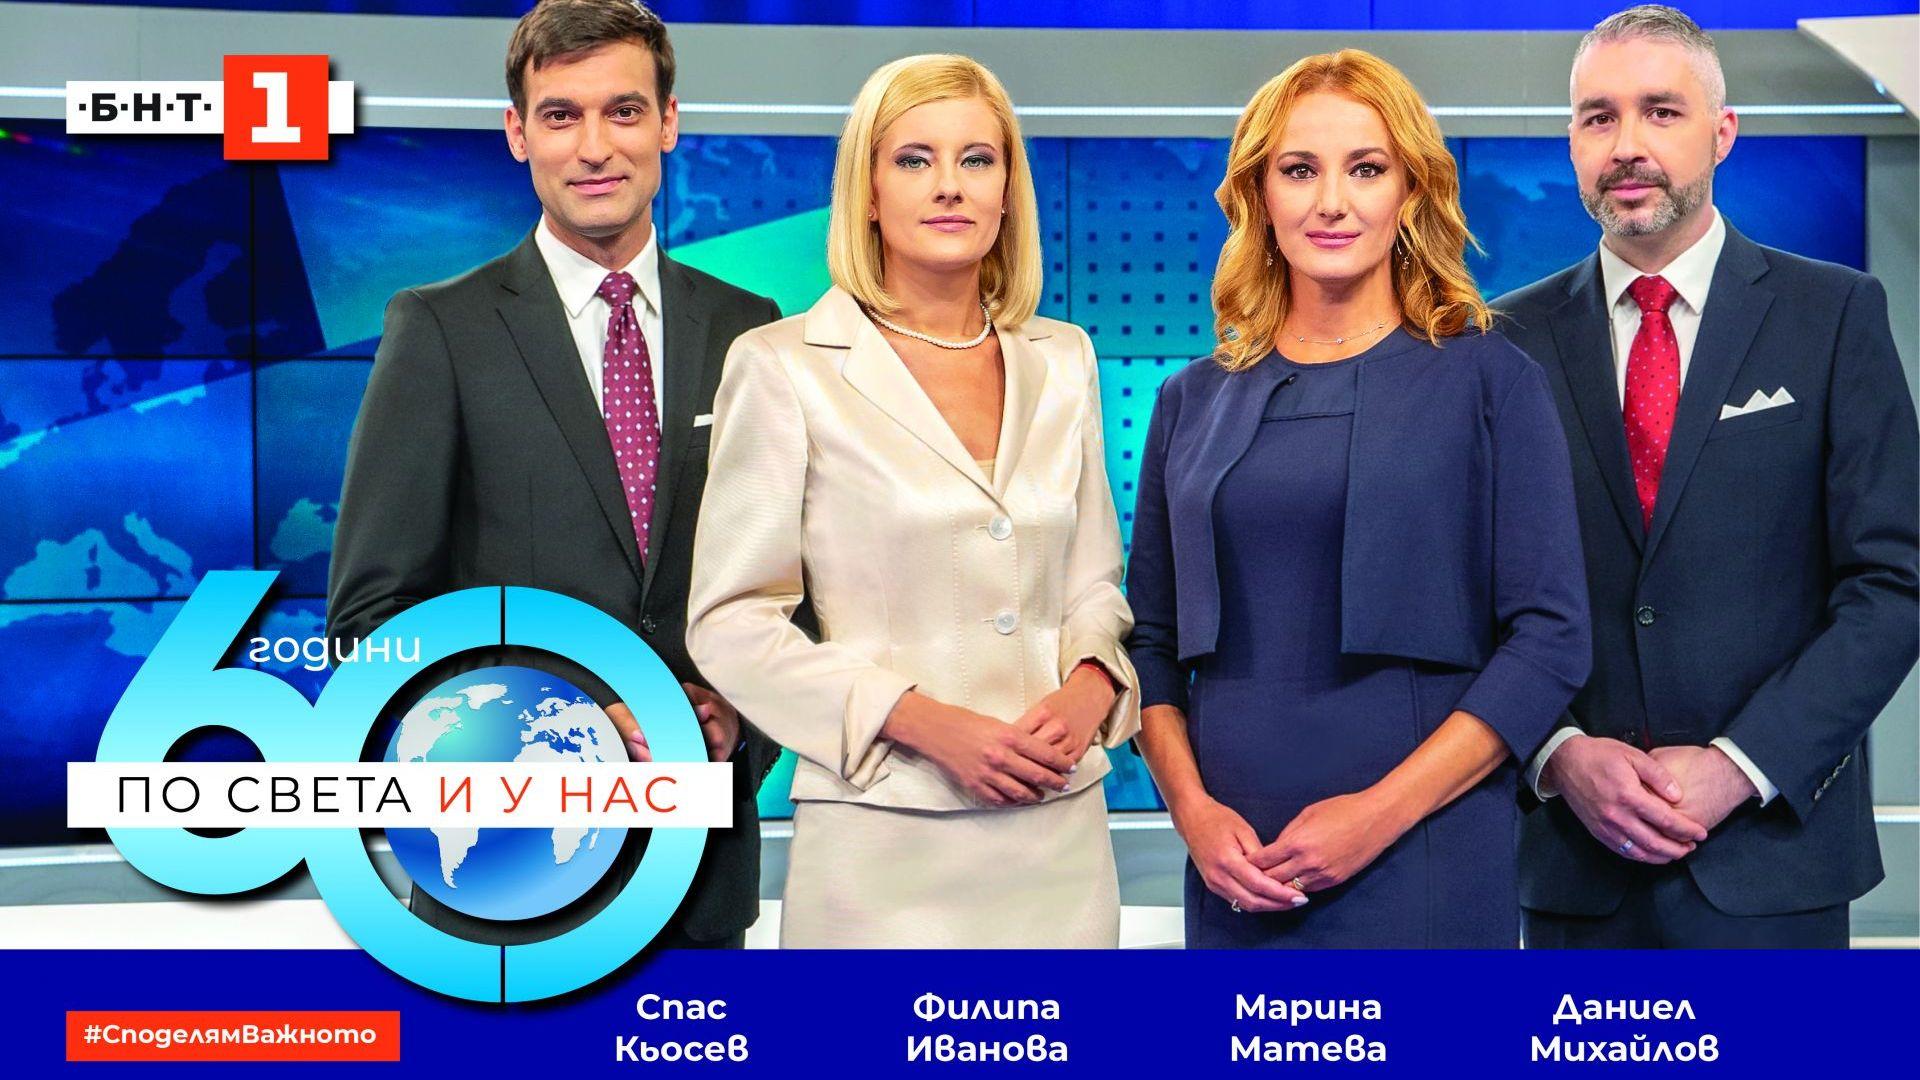 Марина Матева и Даниел Михайлов, както и Филипа Иванова и Спас Кьосев